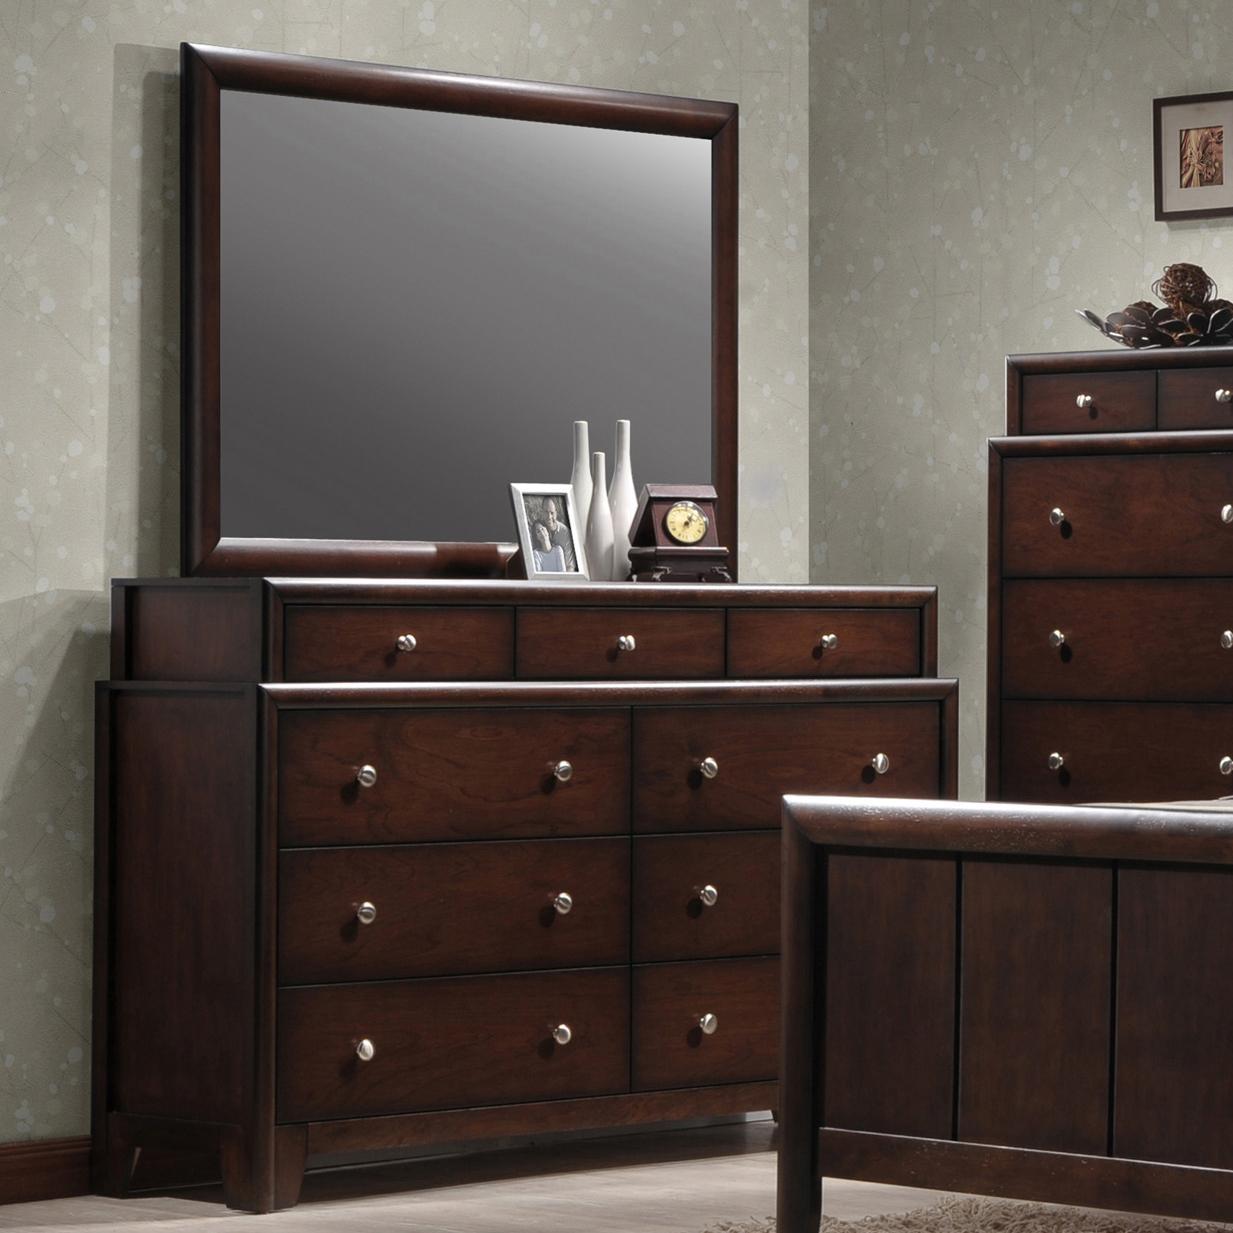 Crown mark rivoli two tier dresser and rectangular mirror for Bedroom bureau knobs